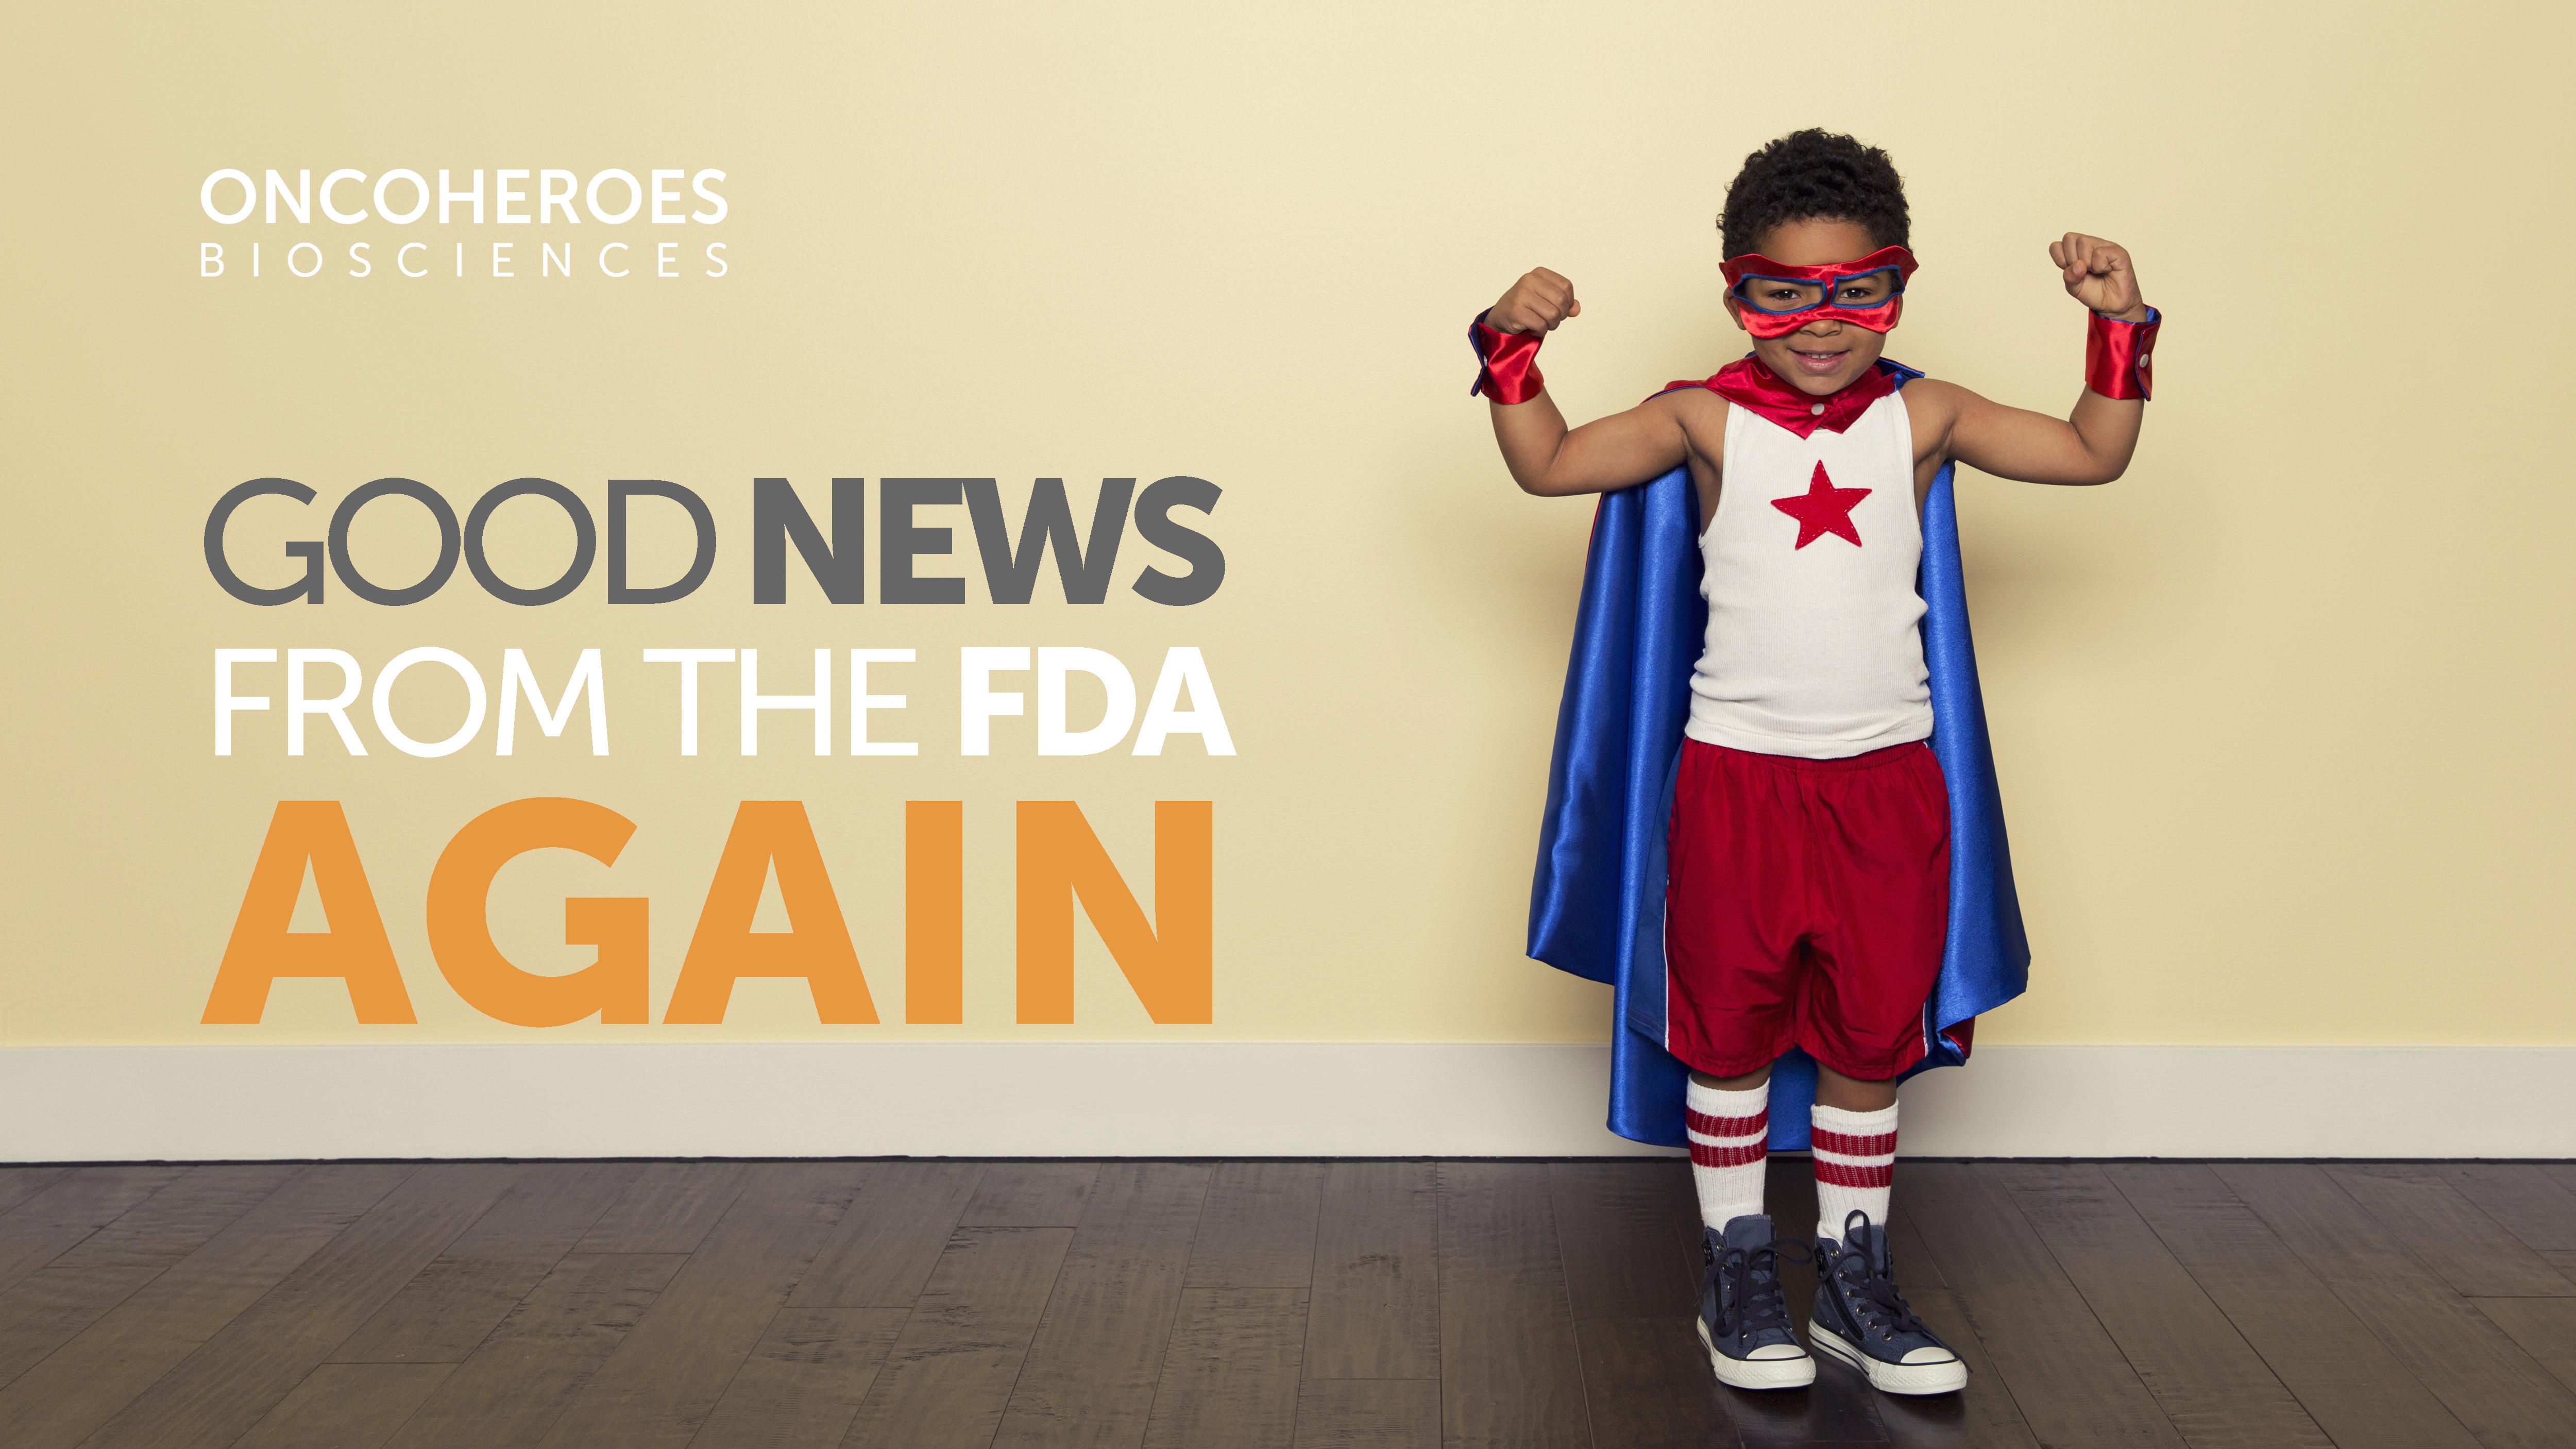 Volasertib, a Potential New Treatment for Rhabdomyosarcoma, Receives Orphan Drug Designation from the U.S. FDA